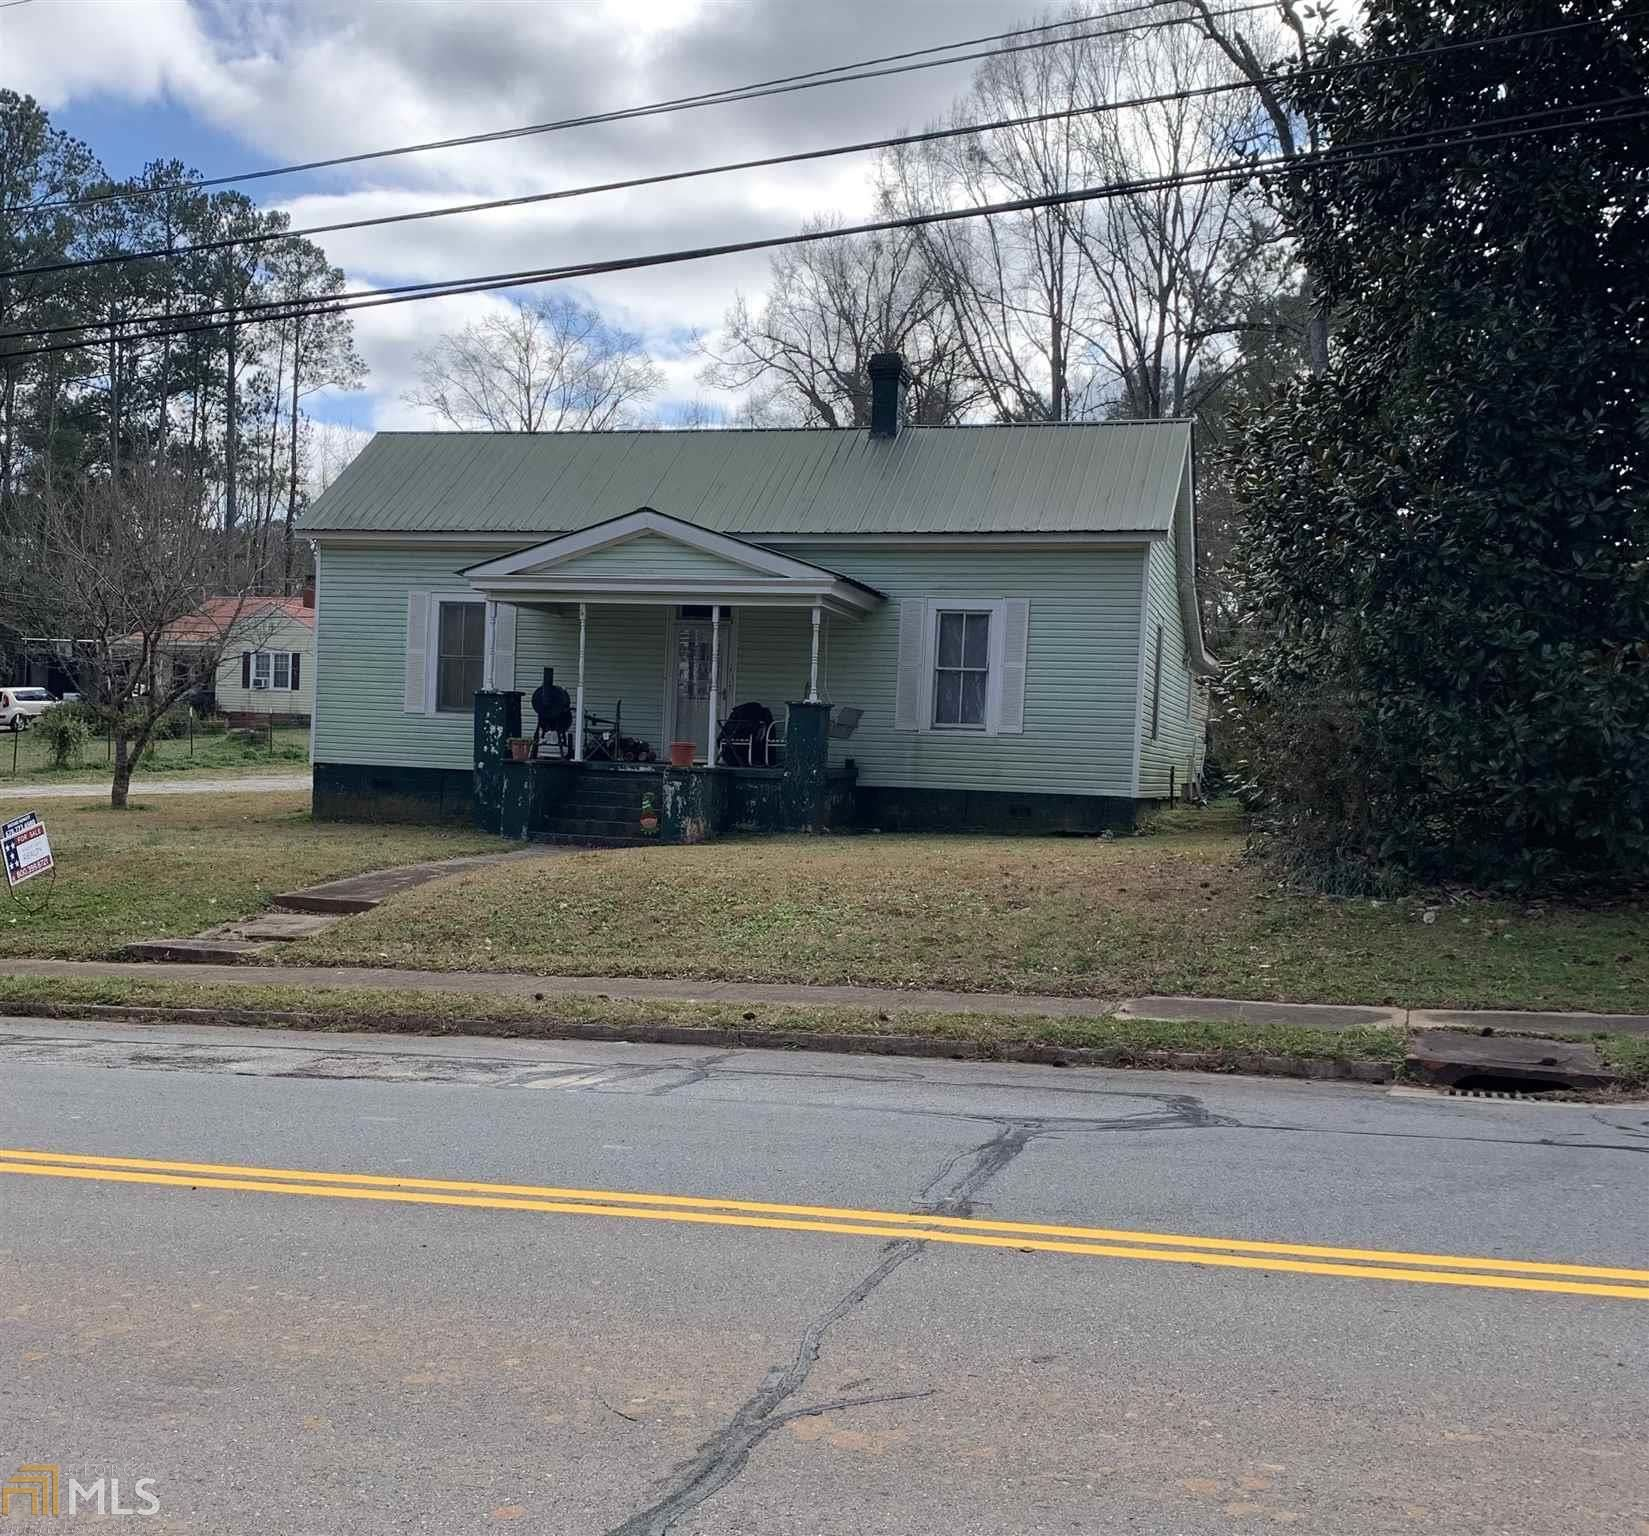 Photo of 950 Eatonton St, Monticello, GA 31064 (MLS # 8926843)